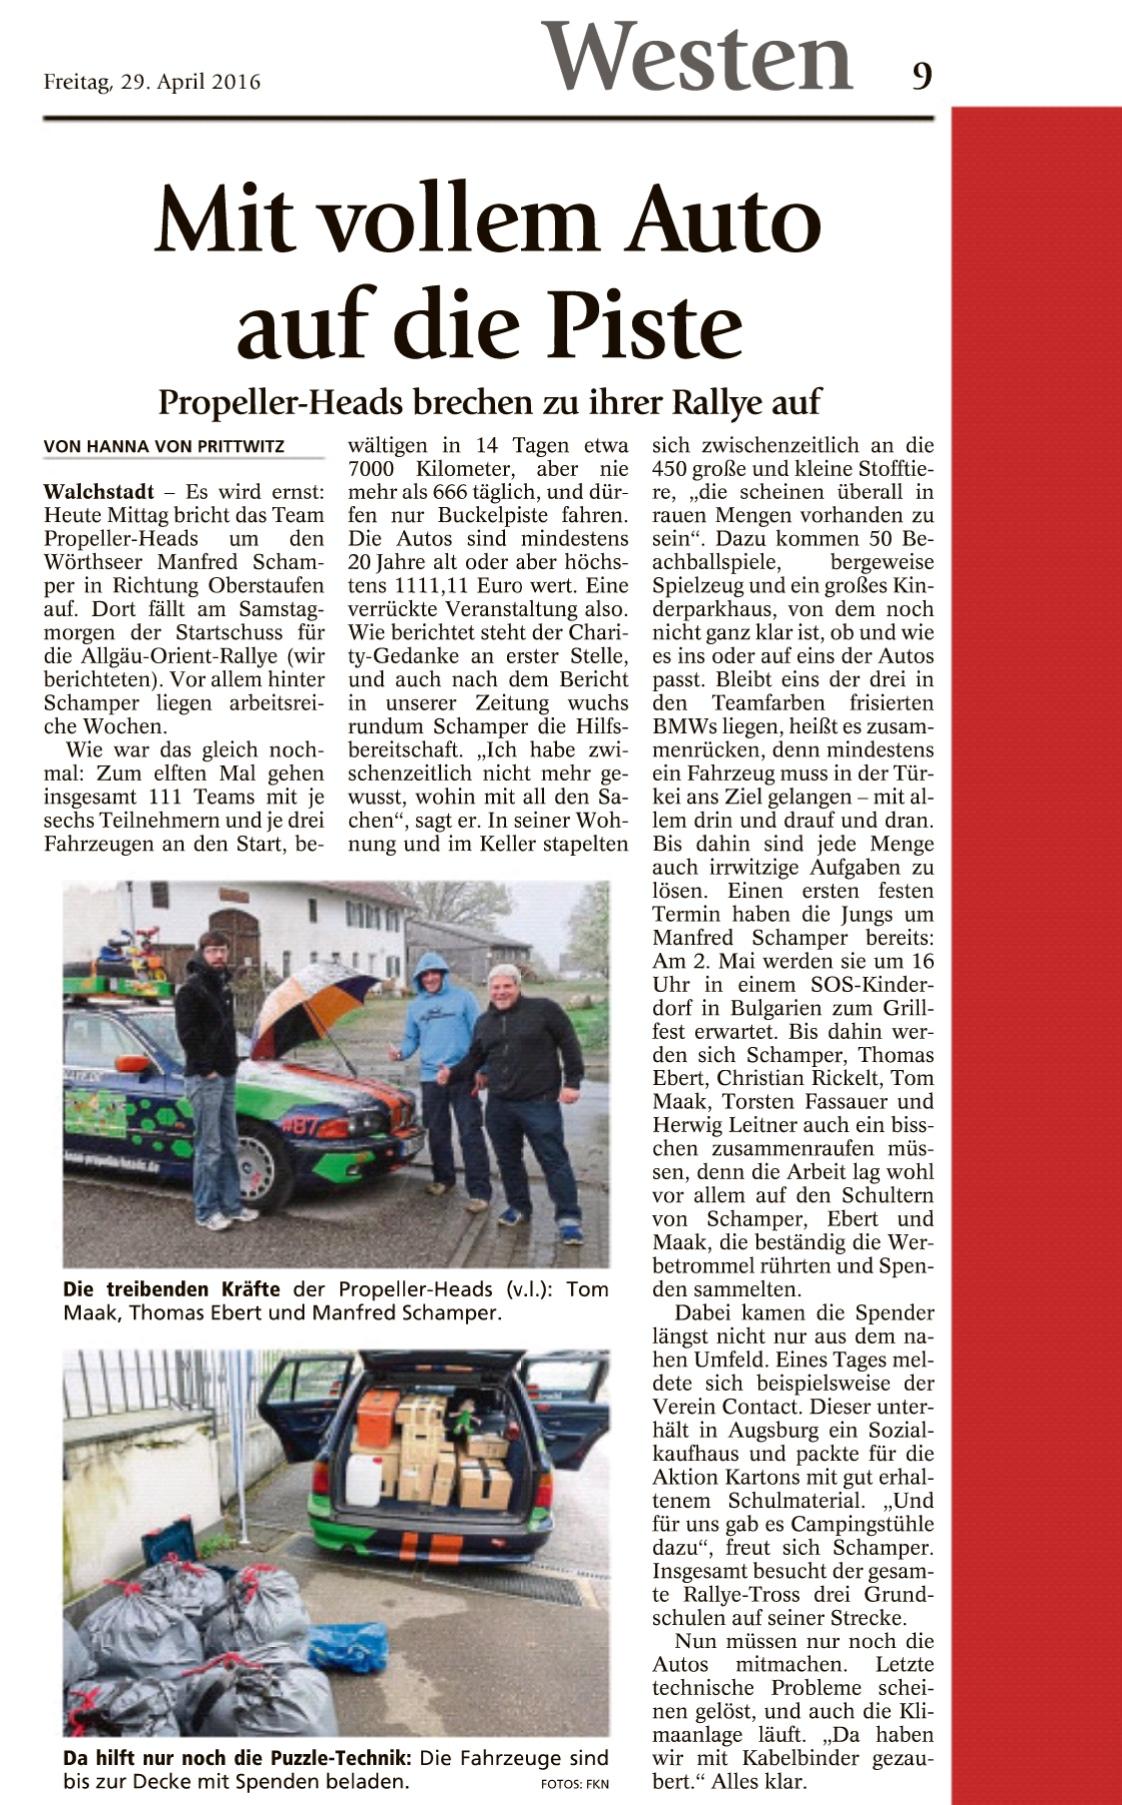 Team Propellerheads - Starnberger Merkur - Allgäu-Orient-Rallye 2016 - Manfred Schamper - Thomas Ebert - Tom Maak